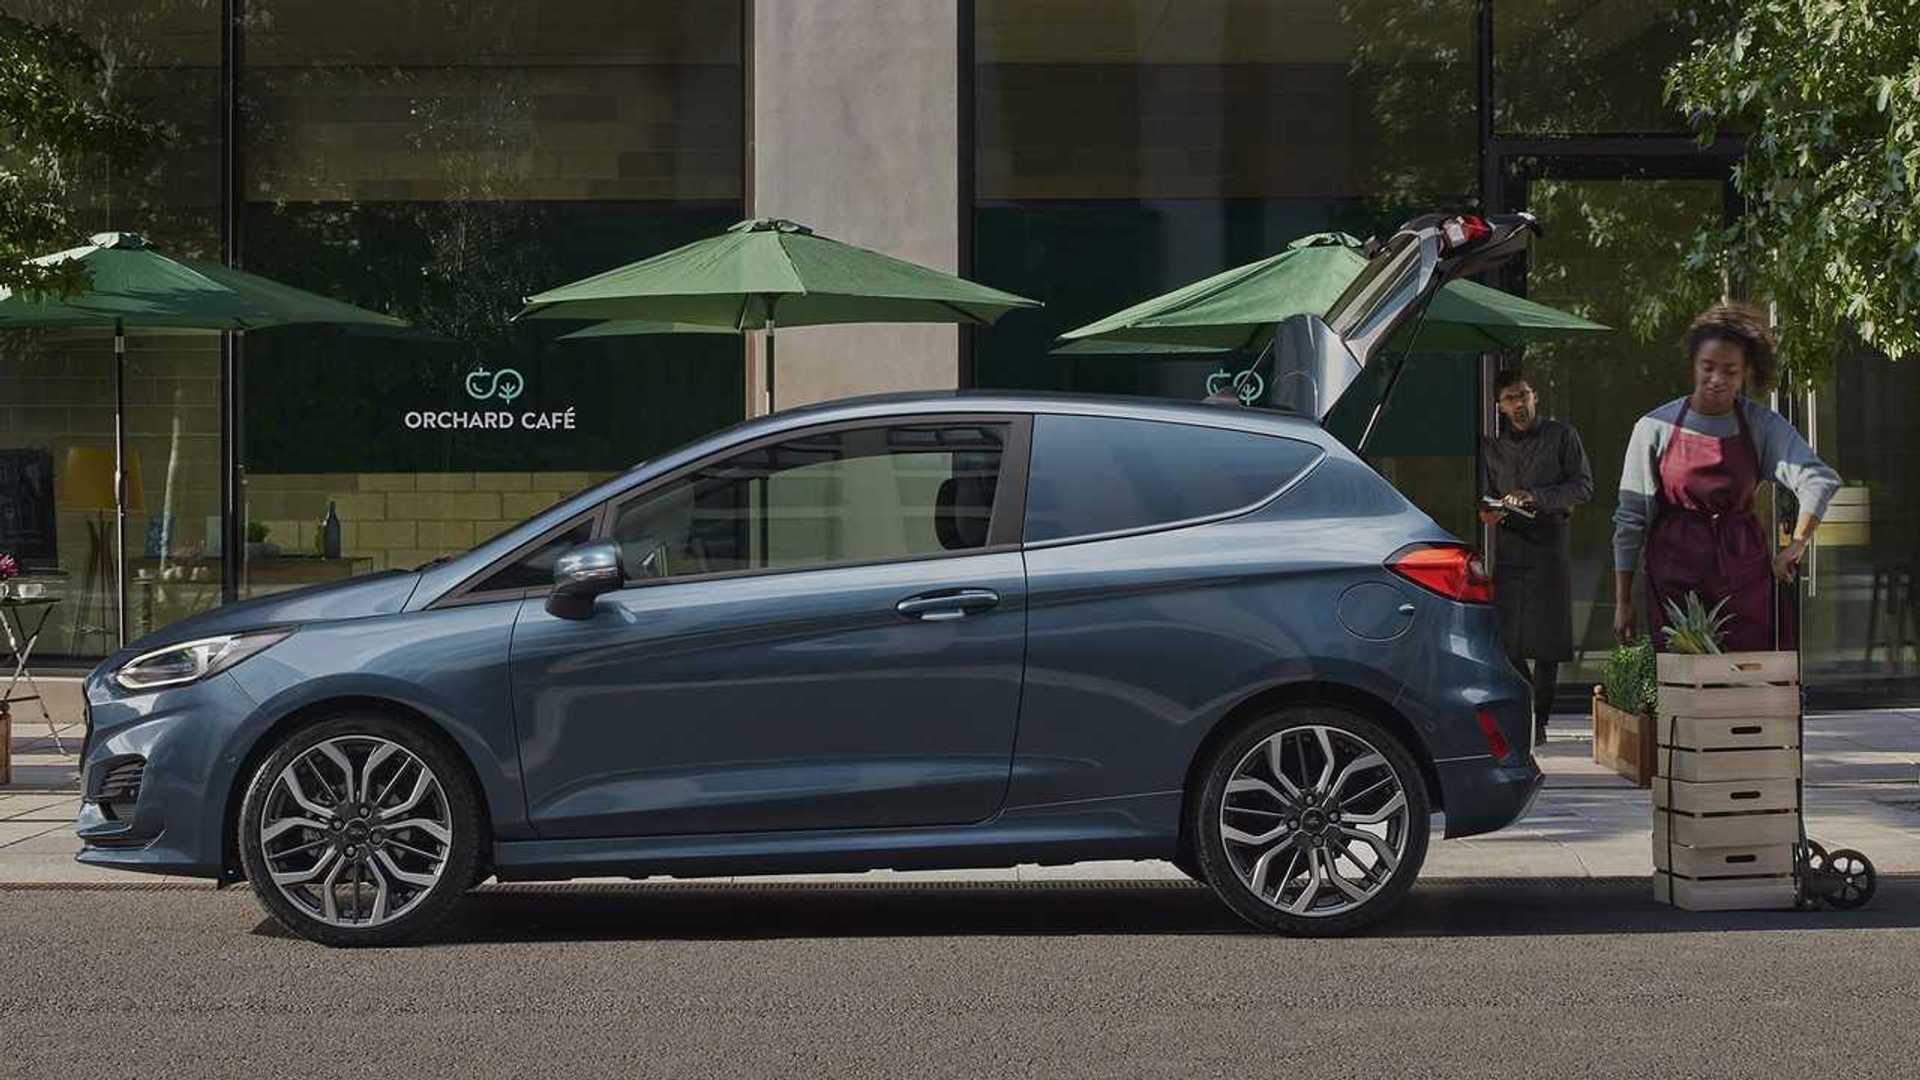 Nuova Ford Fiesta Van, tecnologia Ibrida e pulita